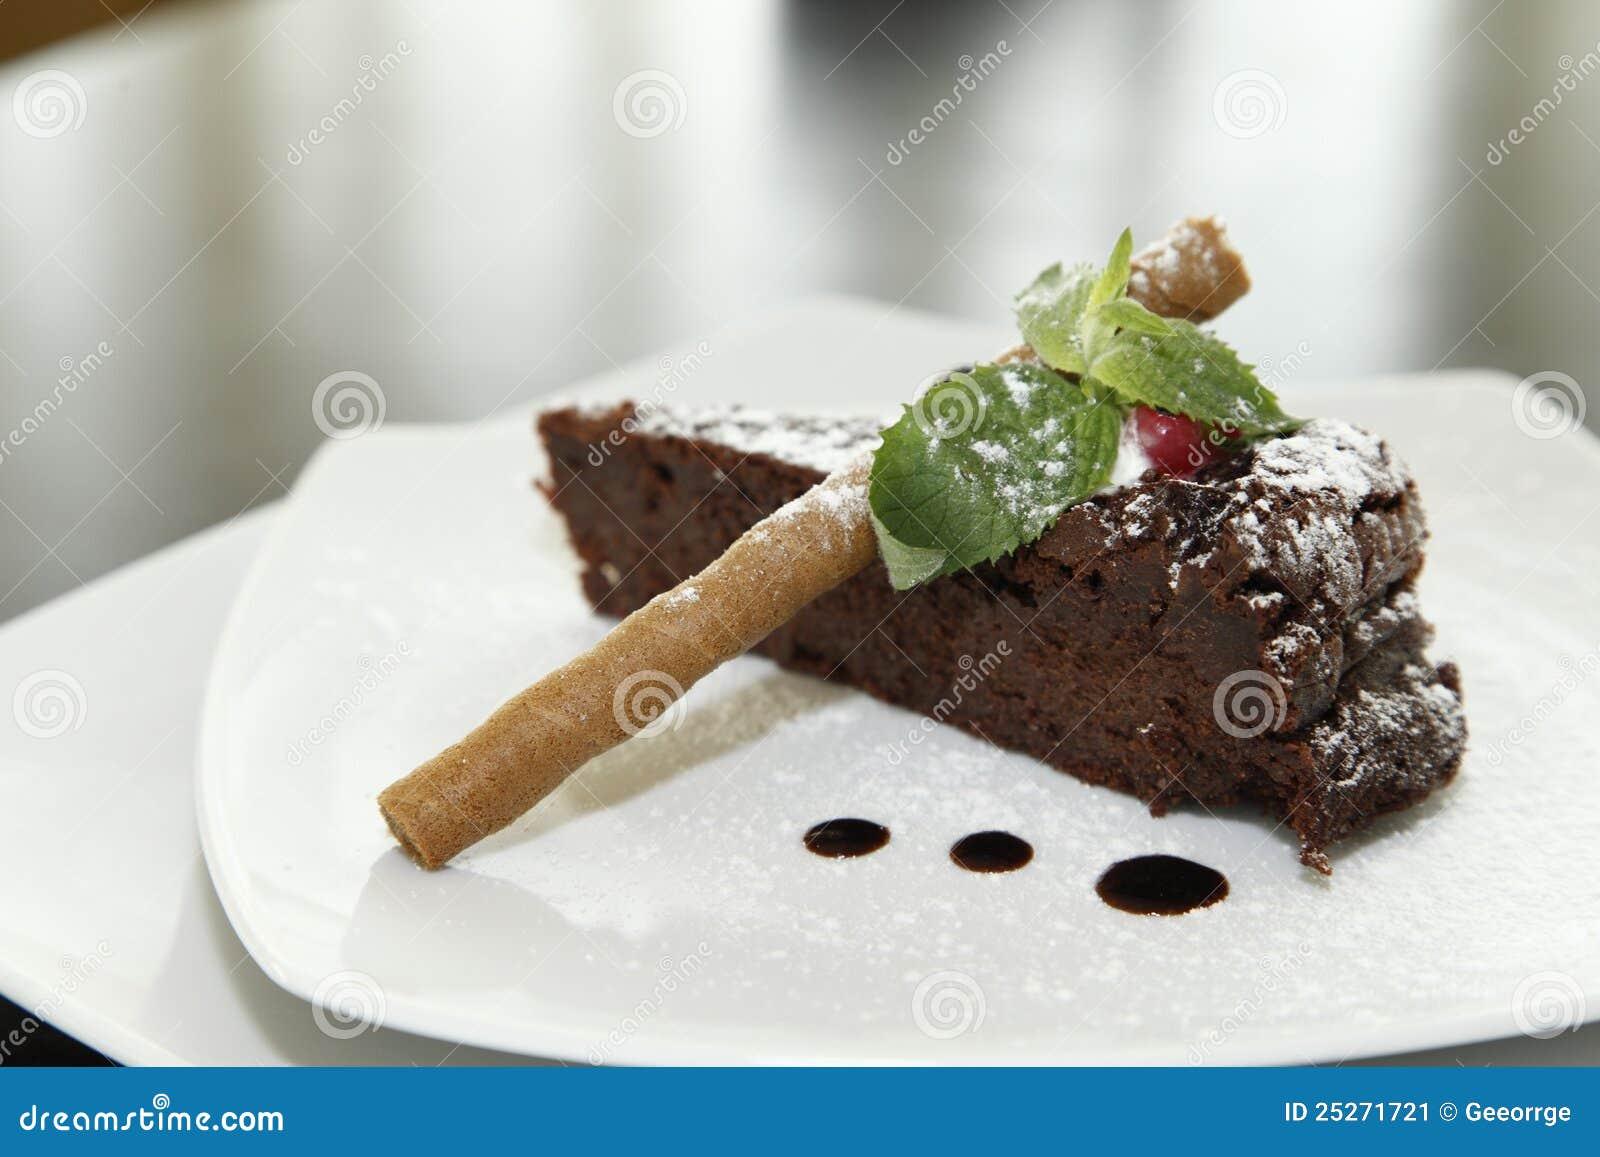 Chocolate Cake Dessert Stock Image - Image: 25271721